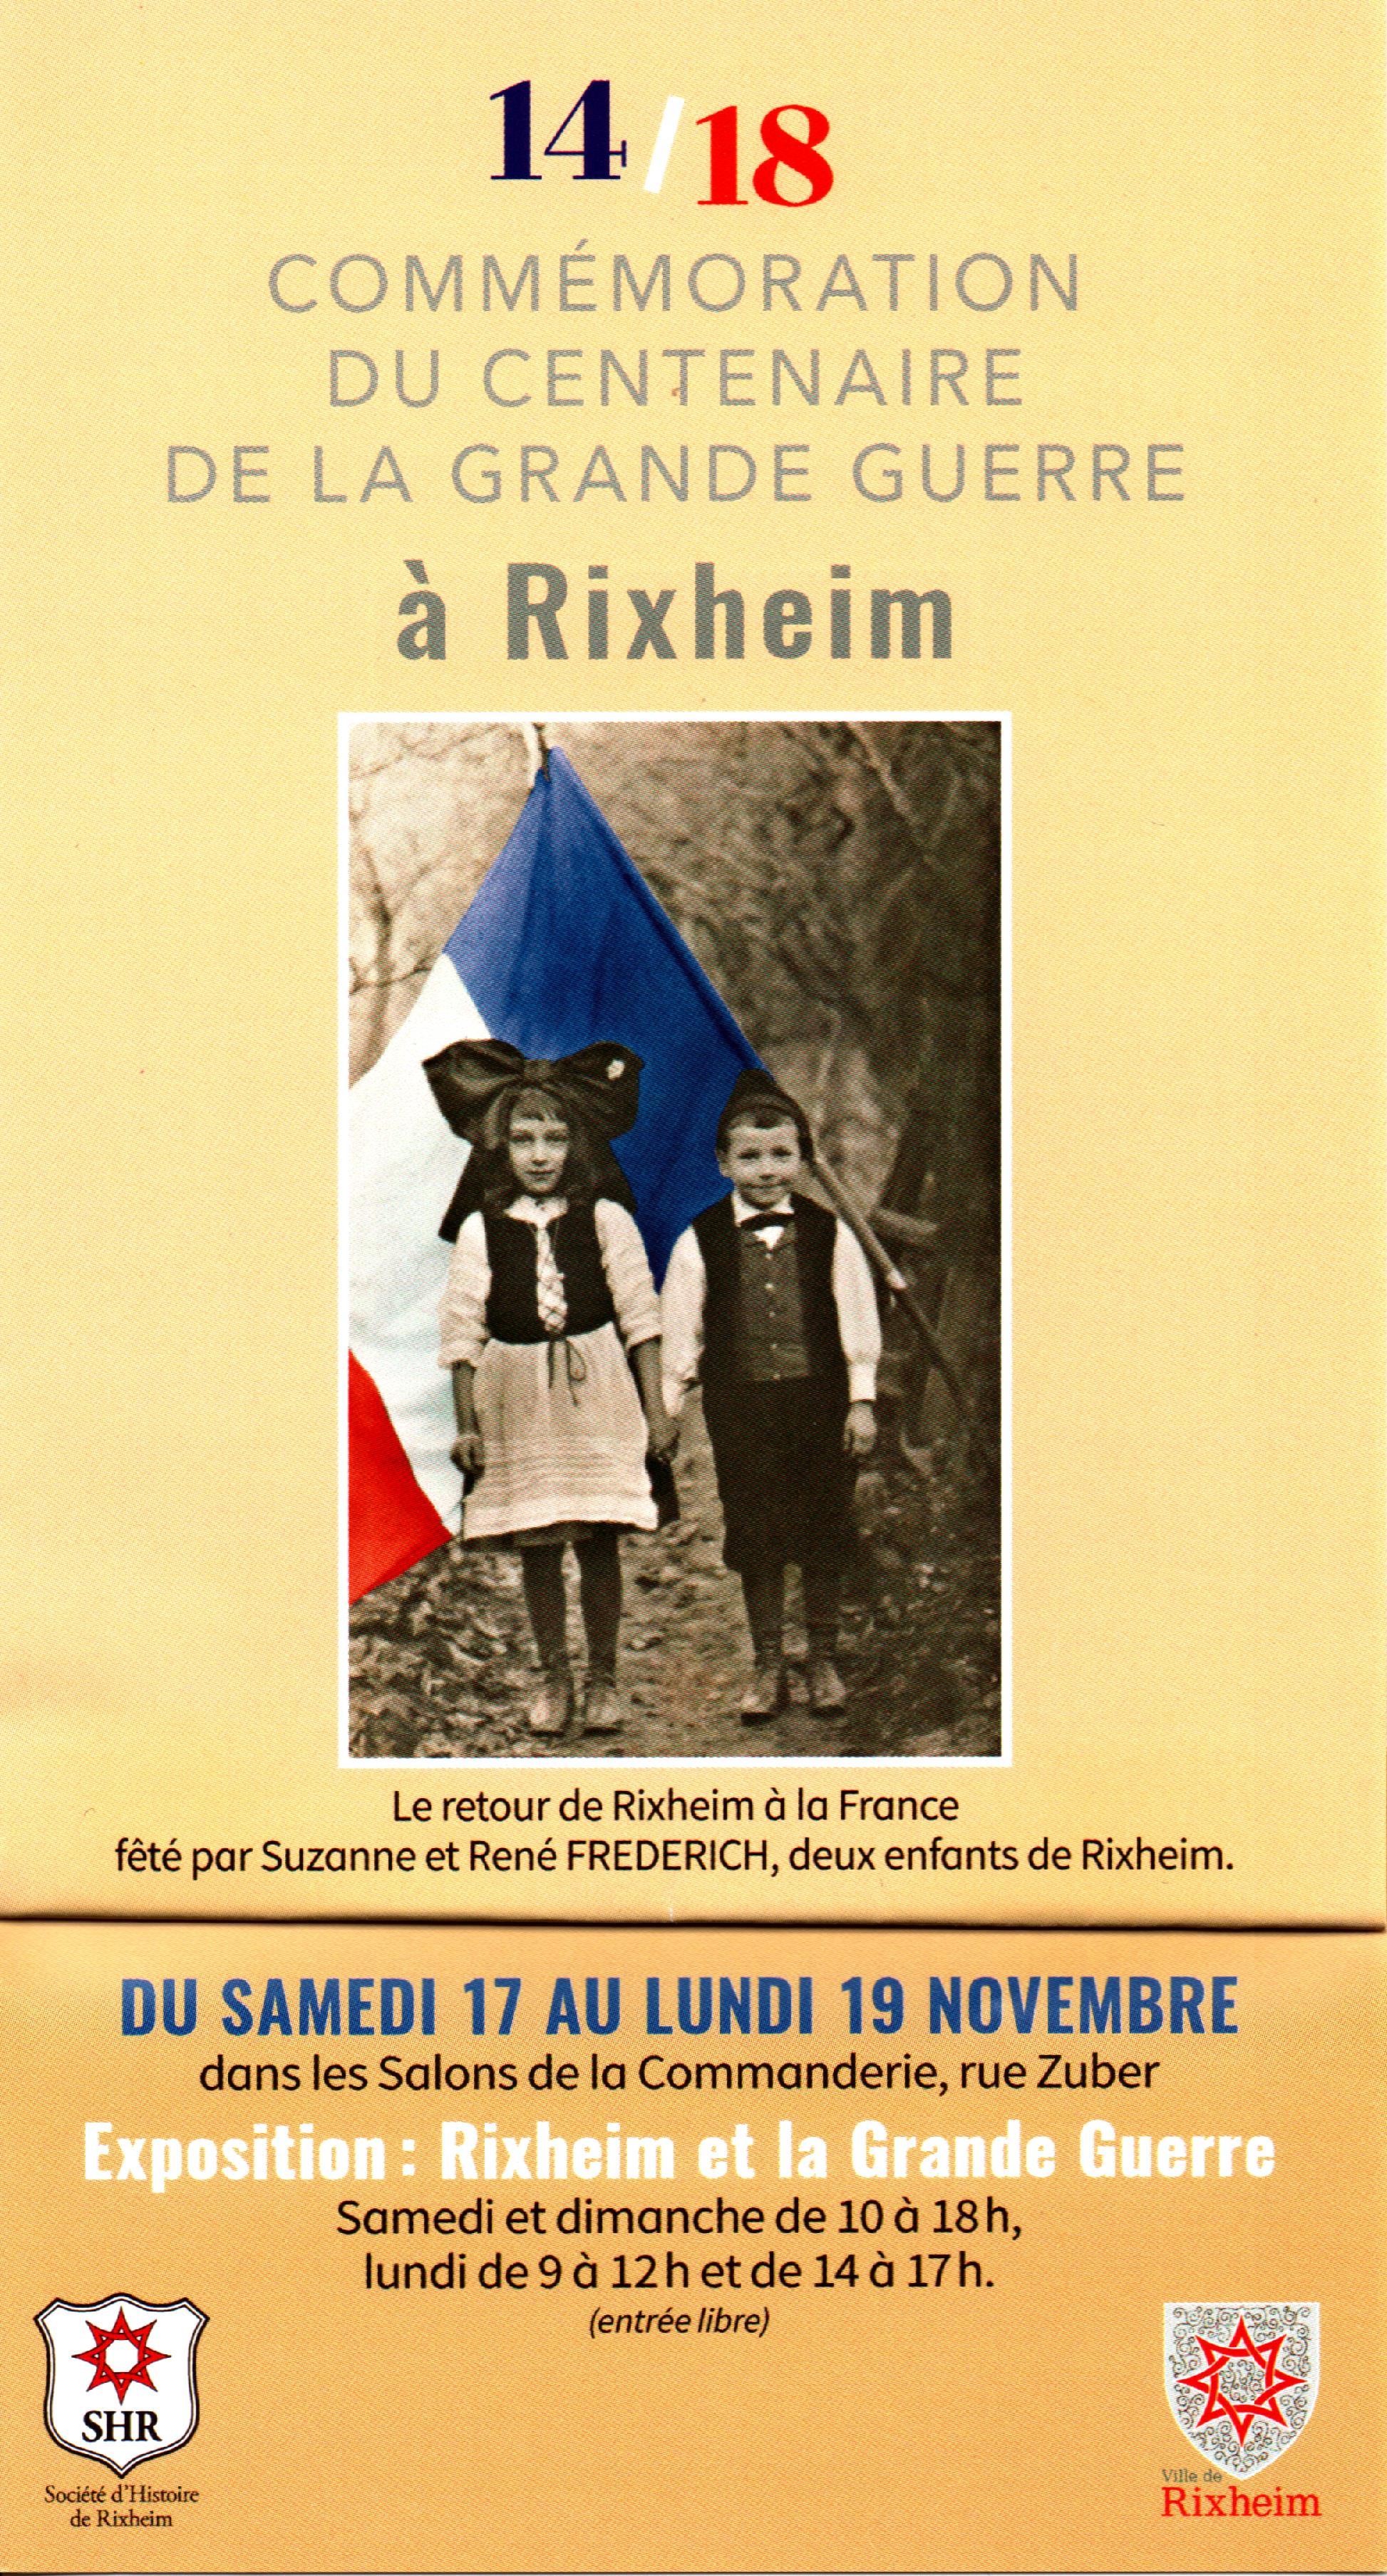 Exposition Rixheim et la Grande Guerre